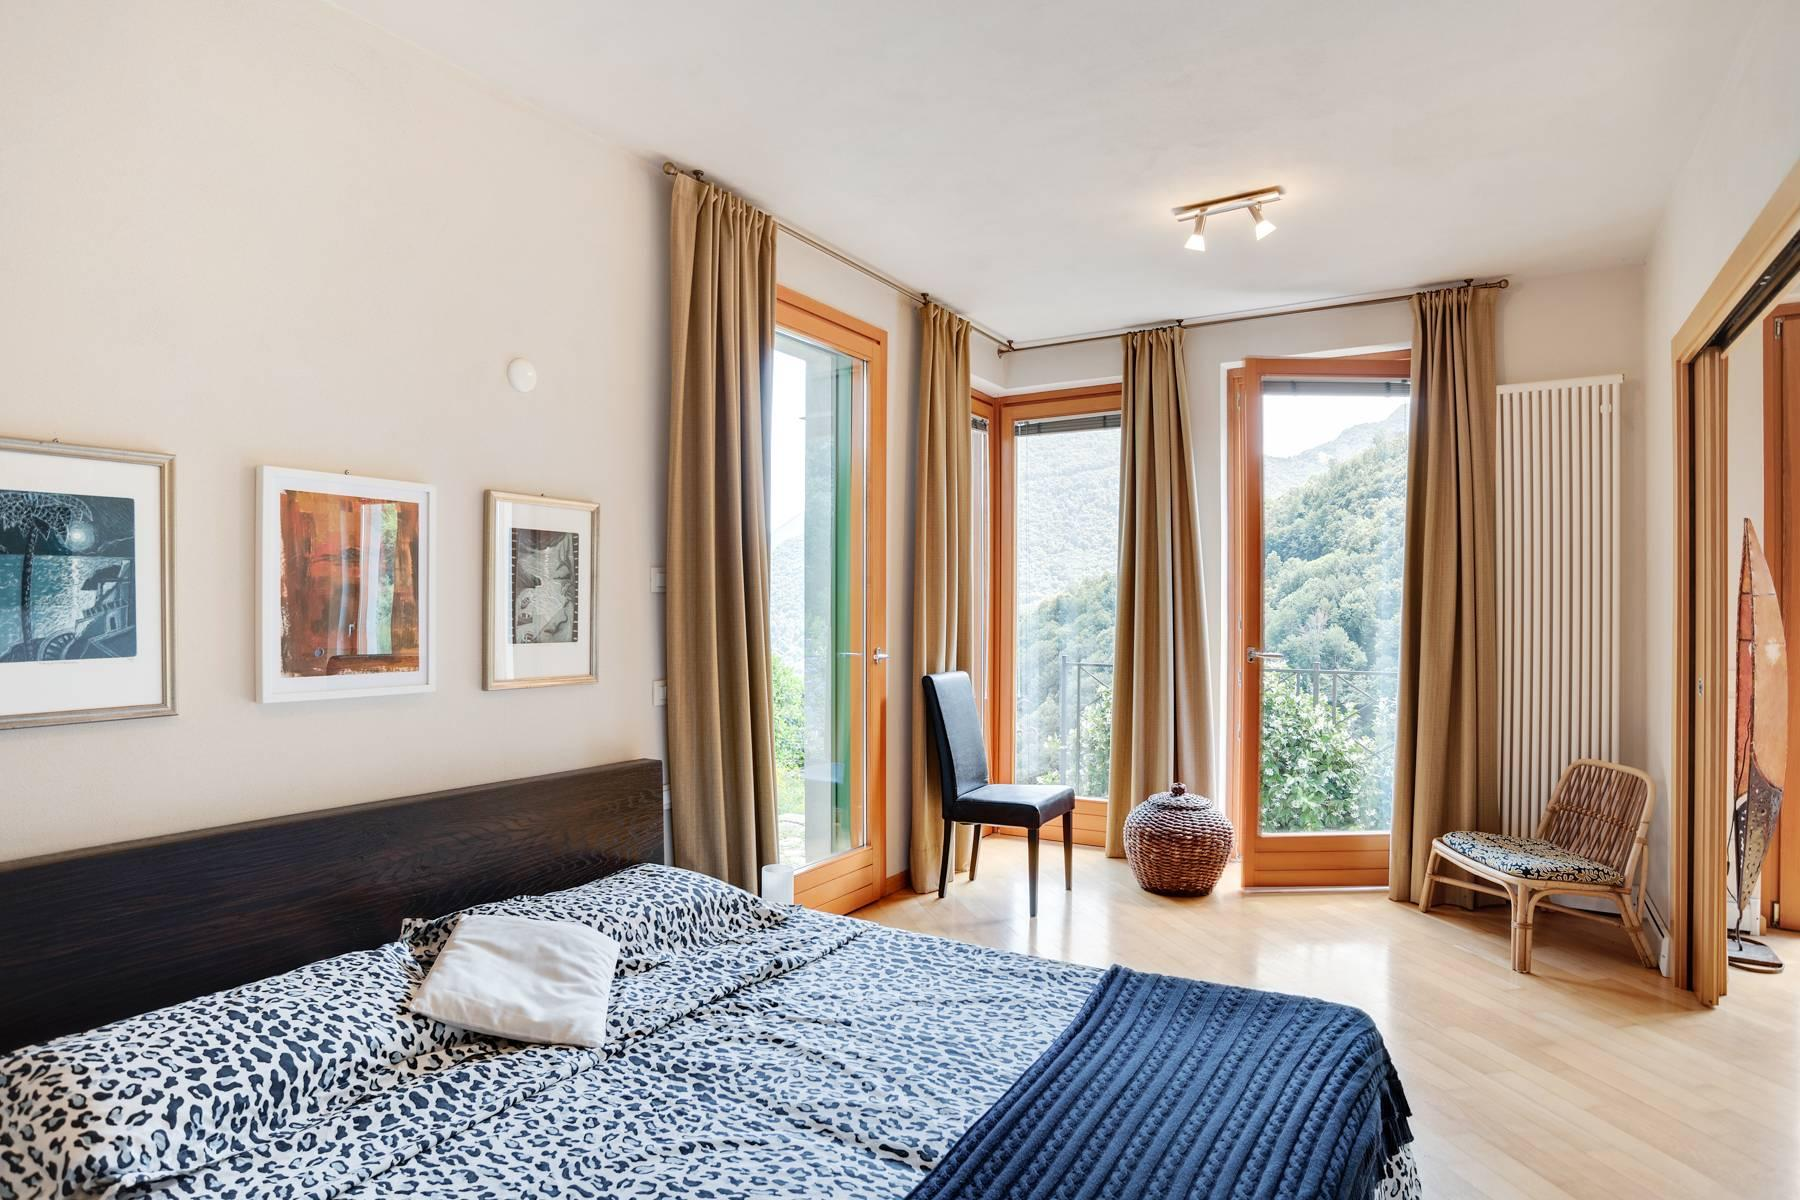 Splendida villa moderna sulla collina soleggiata sopra Argegno - 39